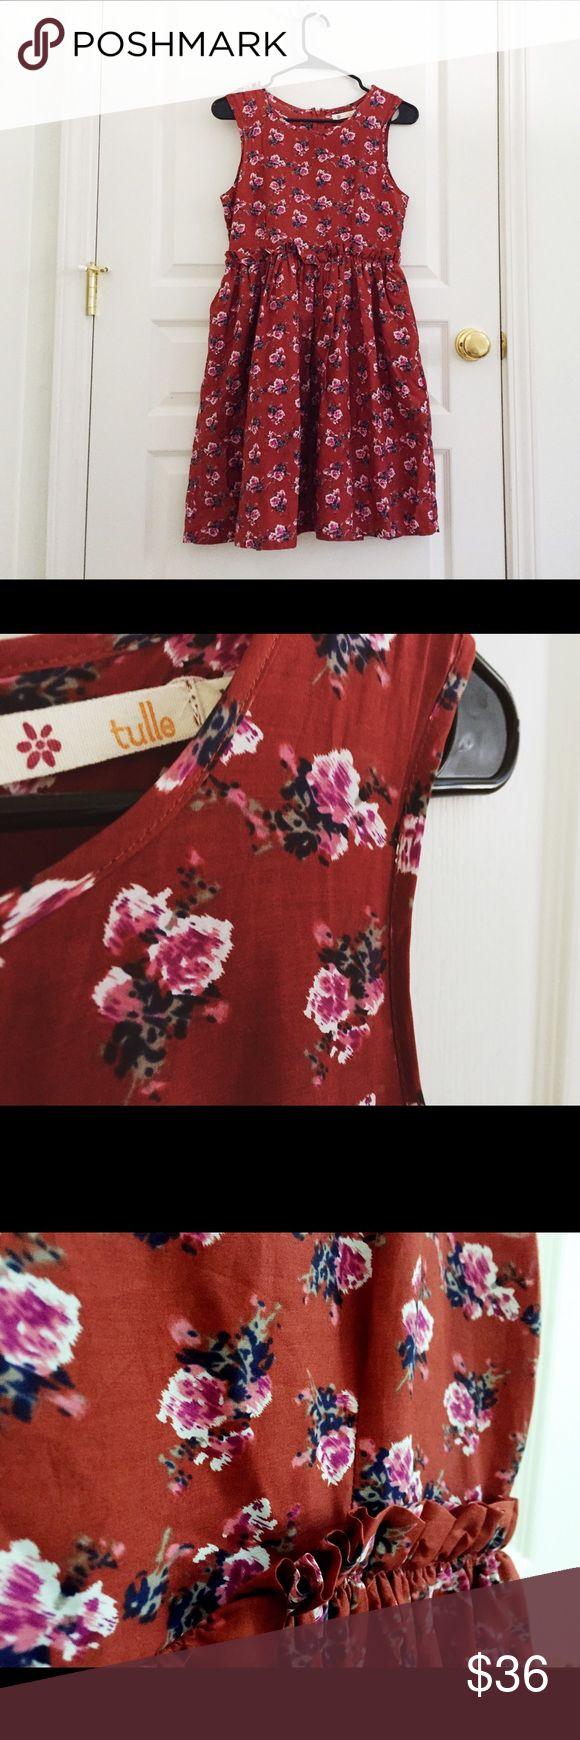 Selling this Modcloth Tulle floral ruffle retro mod dress on Poshmark! My username is: wanderlust83. #shopmycloset #poshmark #fashion #shopping #style #forsale #ModCloth #Dresses & Skirts